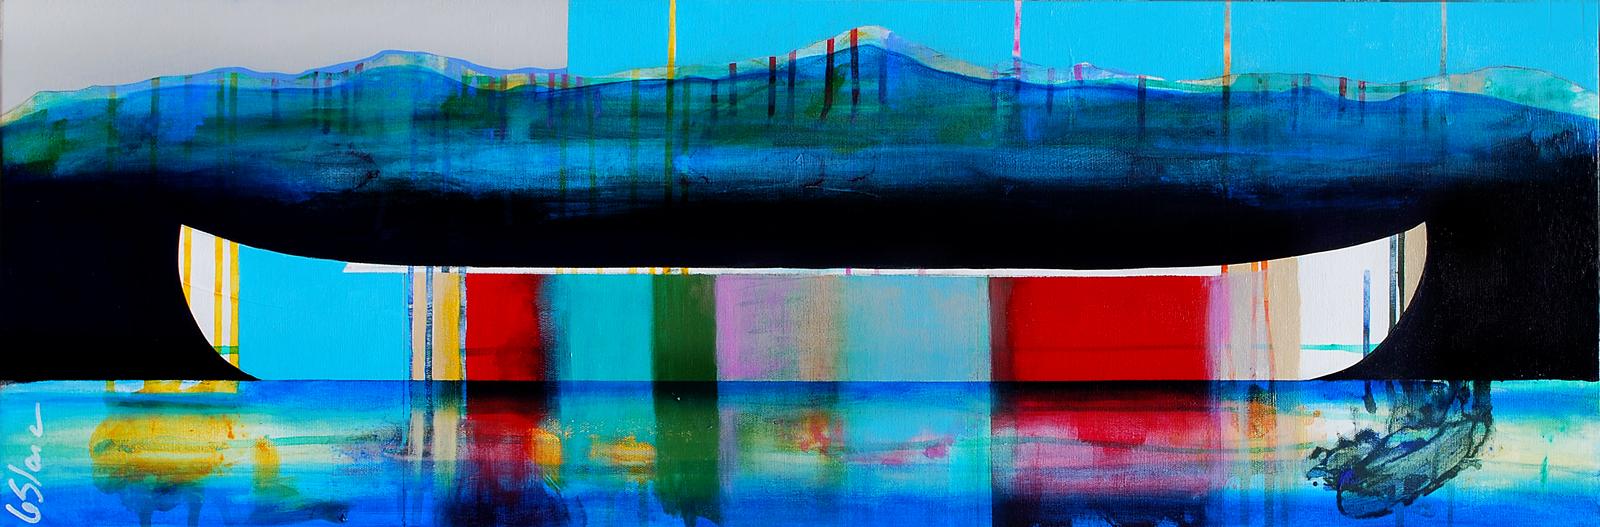 Soupir, mixed media canoe painting by Sylvain Leblanc | Effusion Art Gallery + Cast Glass Studio, Invermere BC